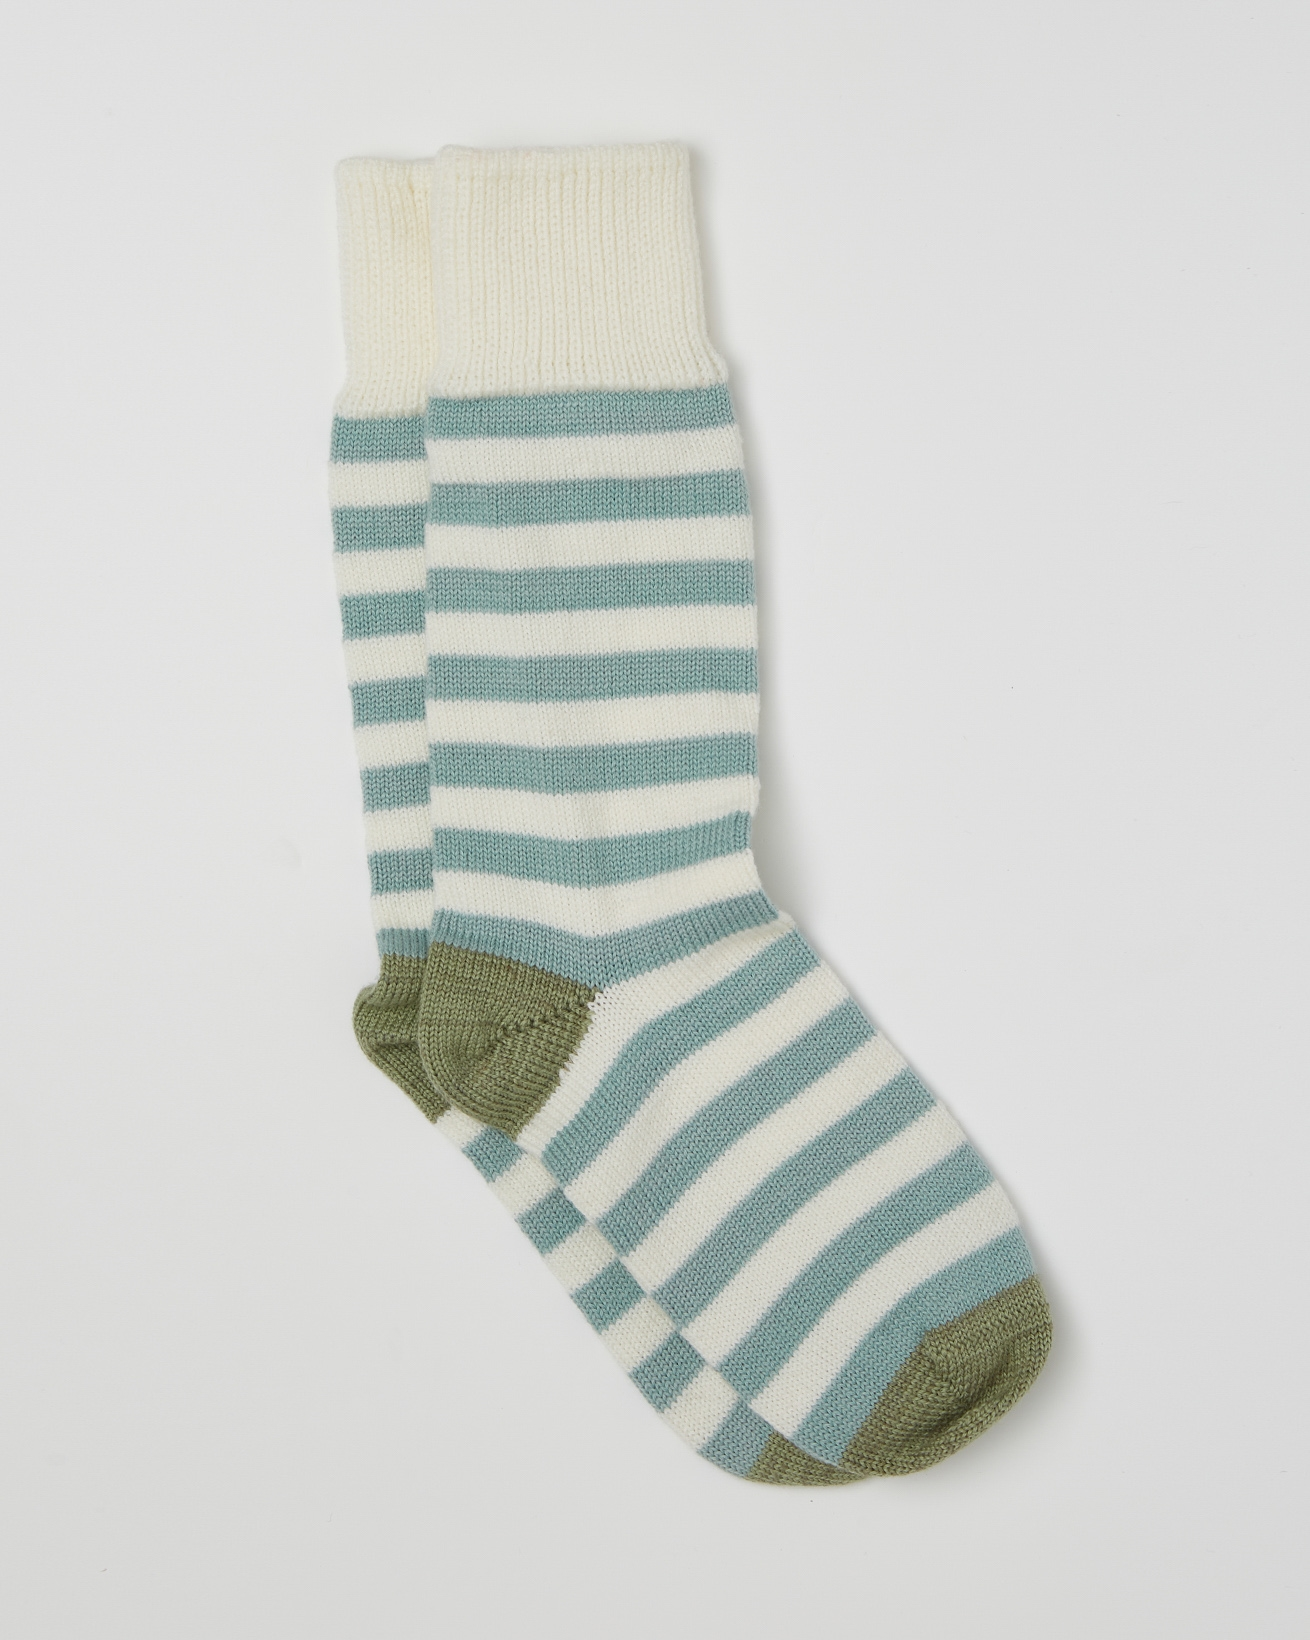 Ladies Cashmere Cotton Allover Stripe Socks - Size Medium -  Sage, Landscape Green - 2469